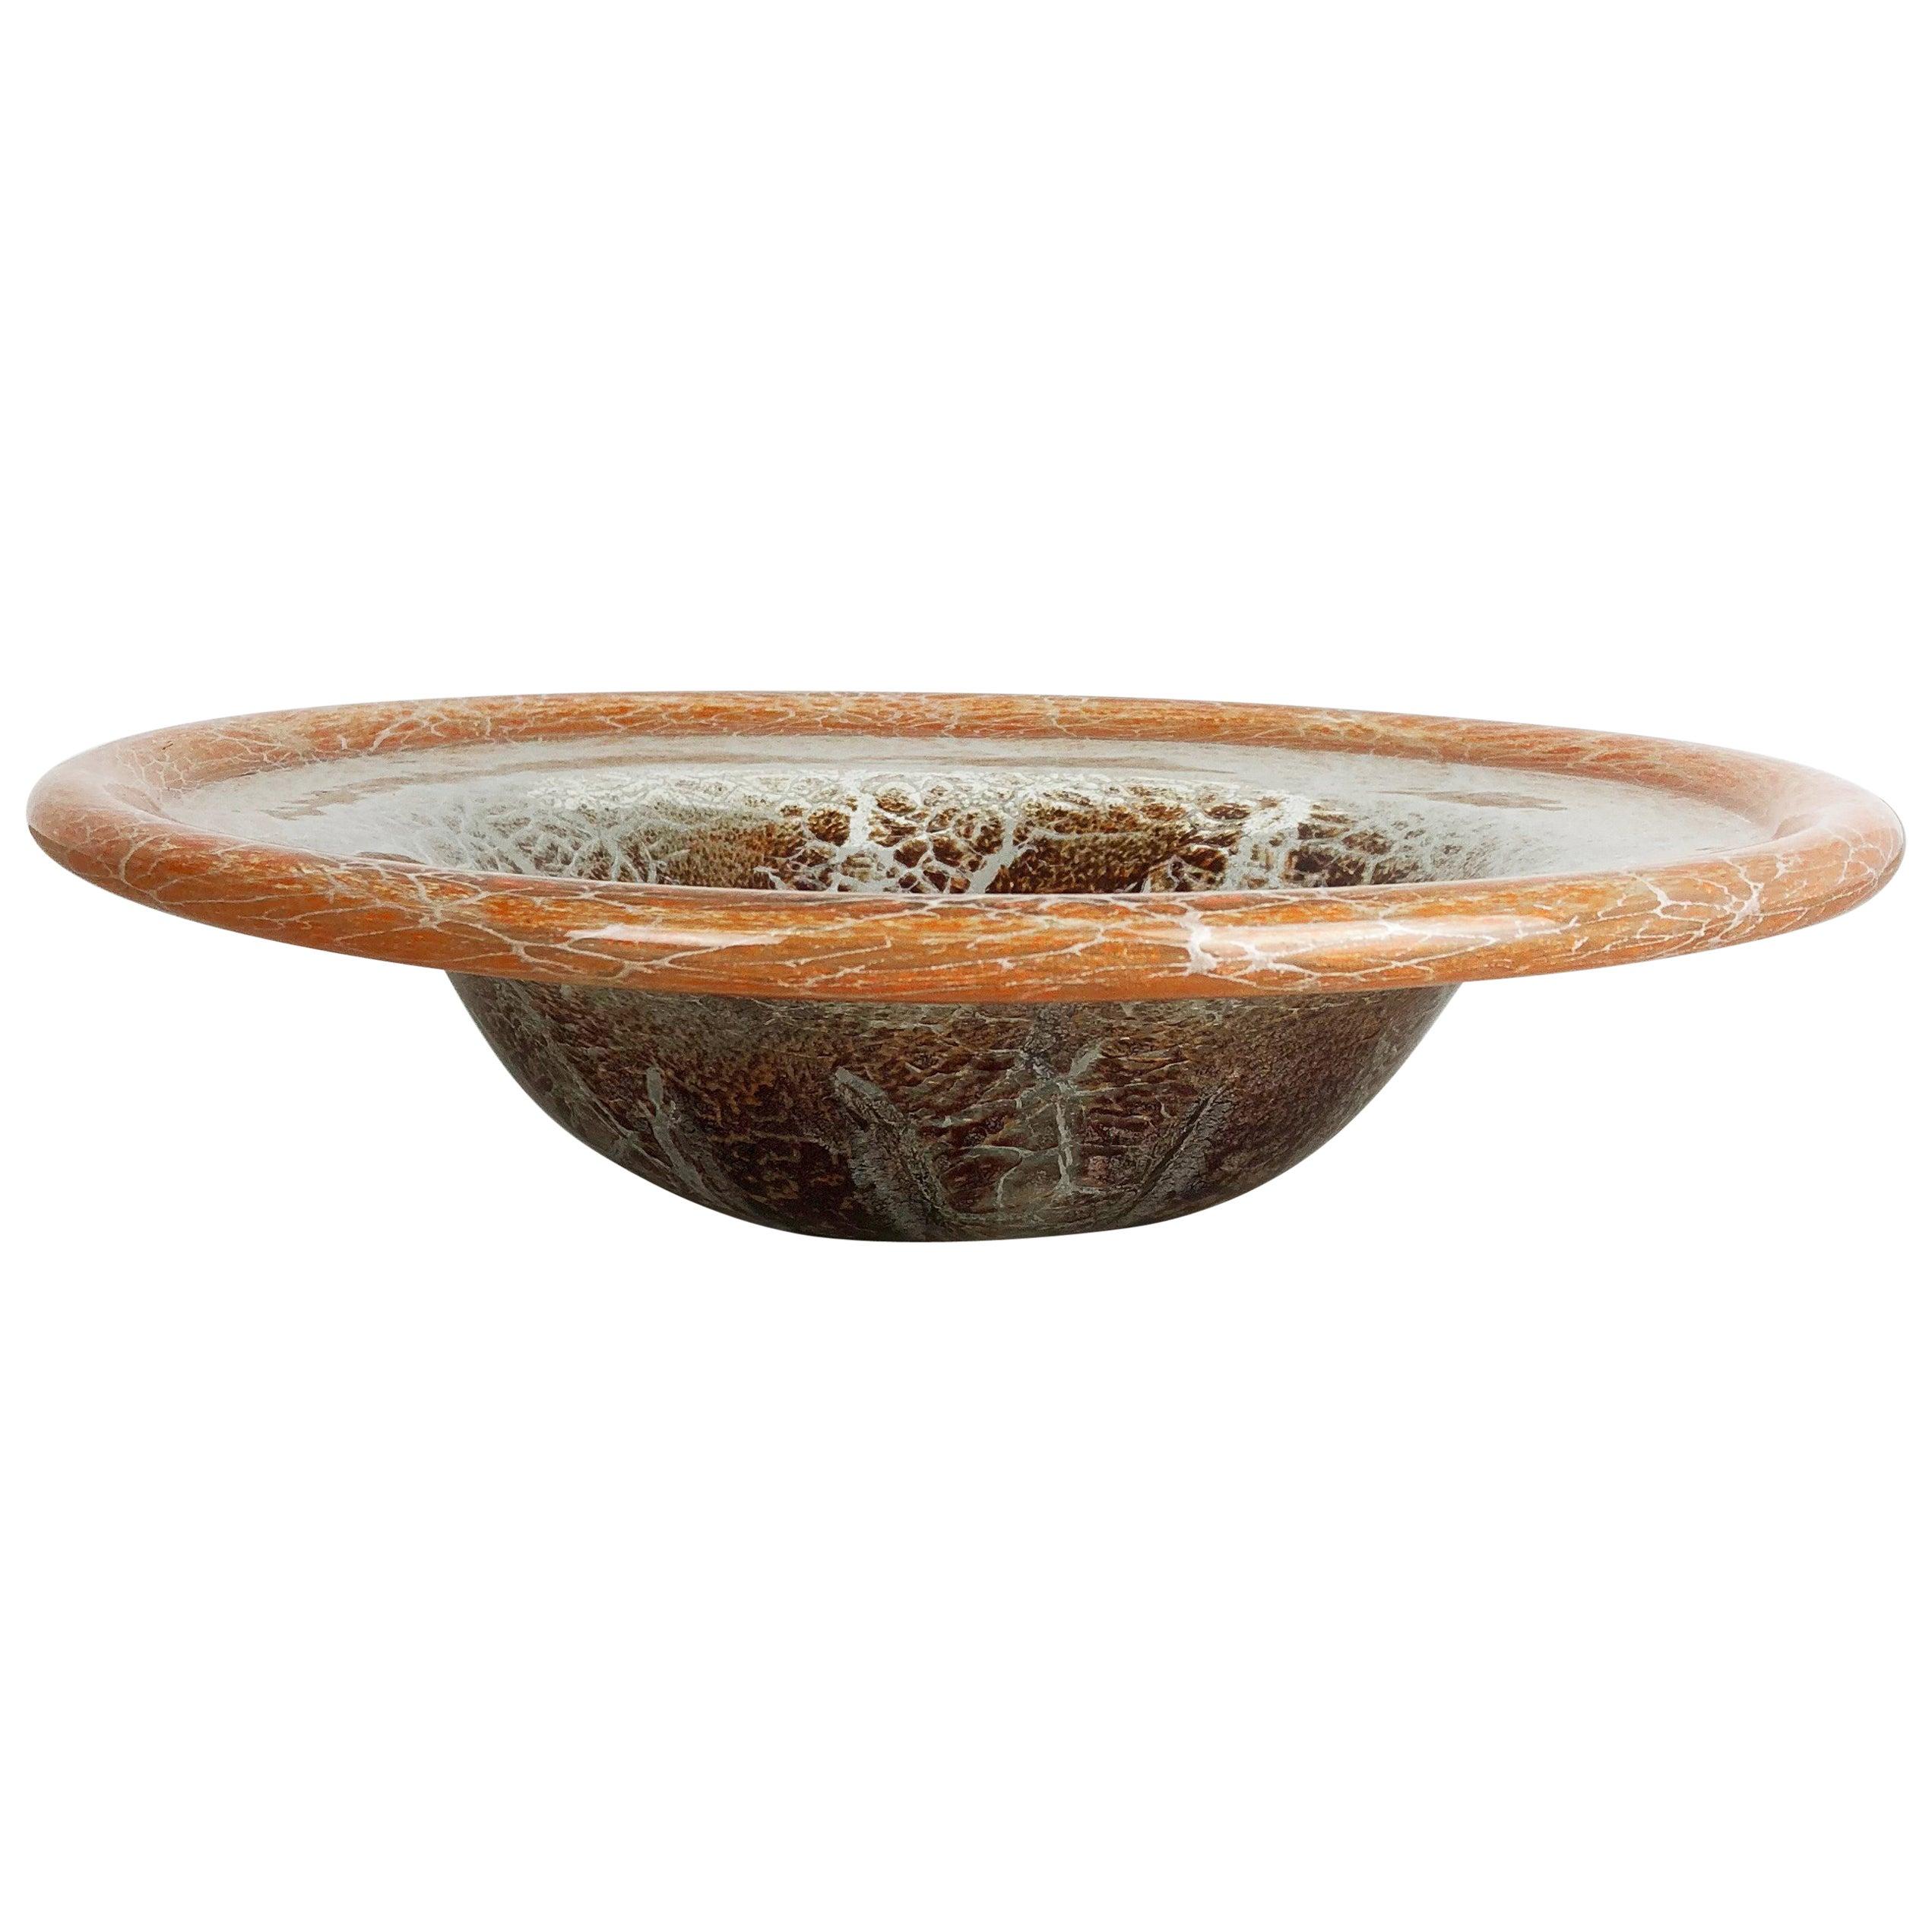 German Glass Bowl by Karl Wiedmann for WMF Ikora, 1930s Baushaus Art Deco